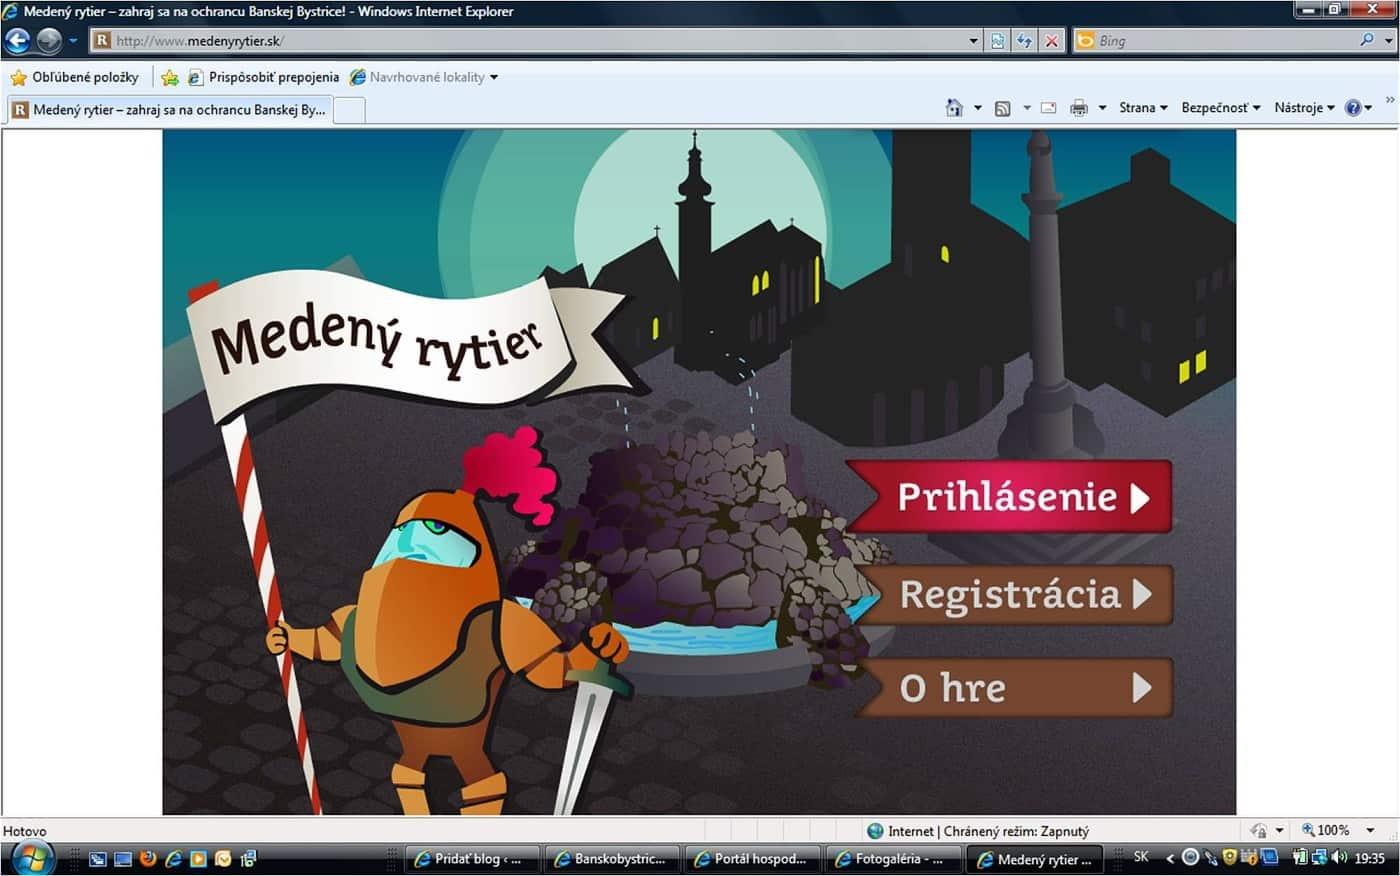 Počítačová hra Medený rytier - úvodná obrazovka hry